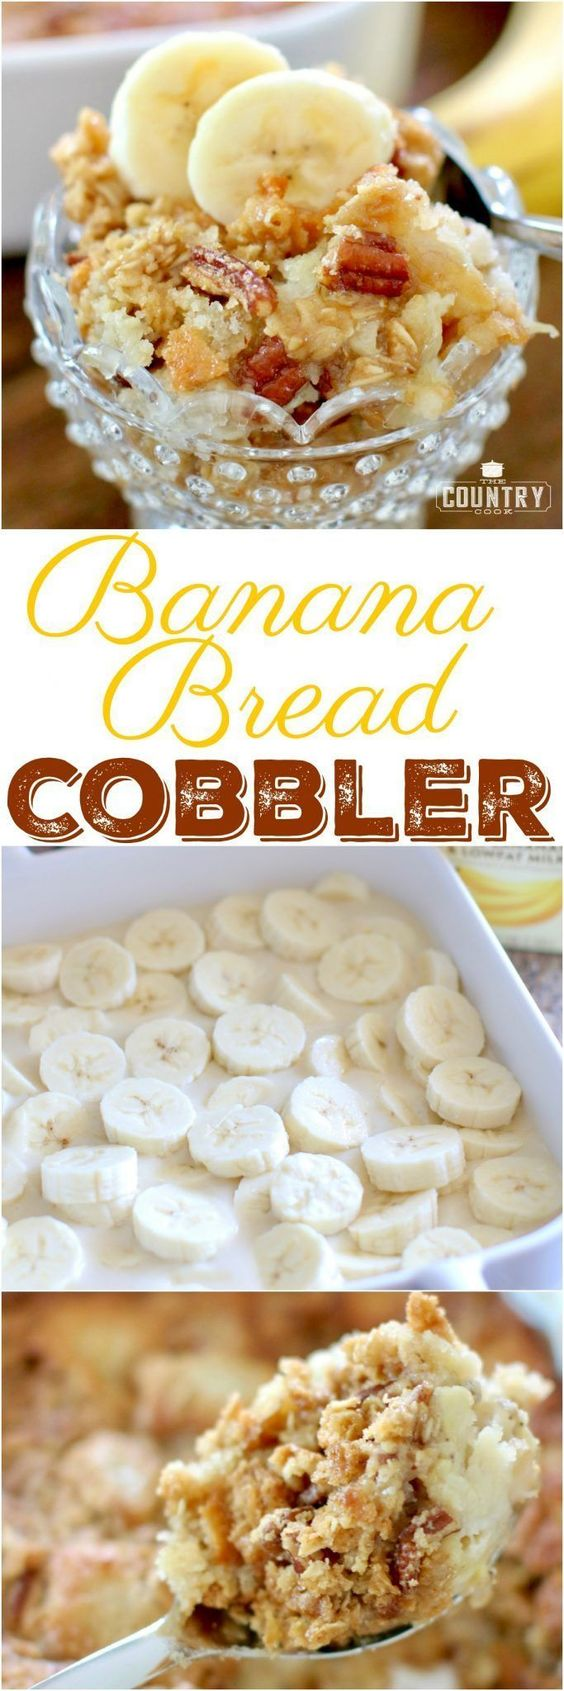 Homemade banana bread cobbler